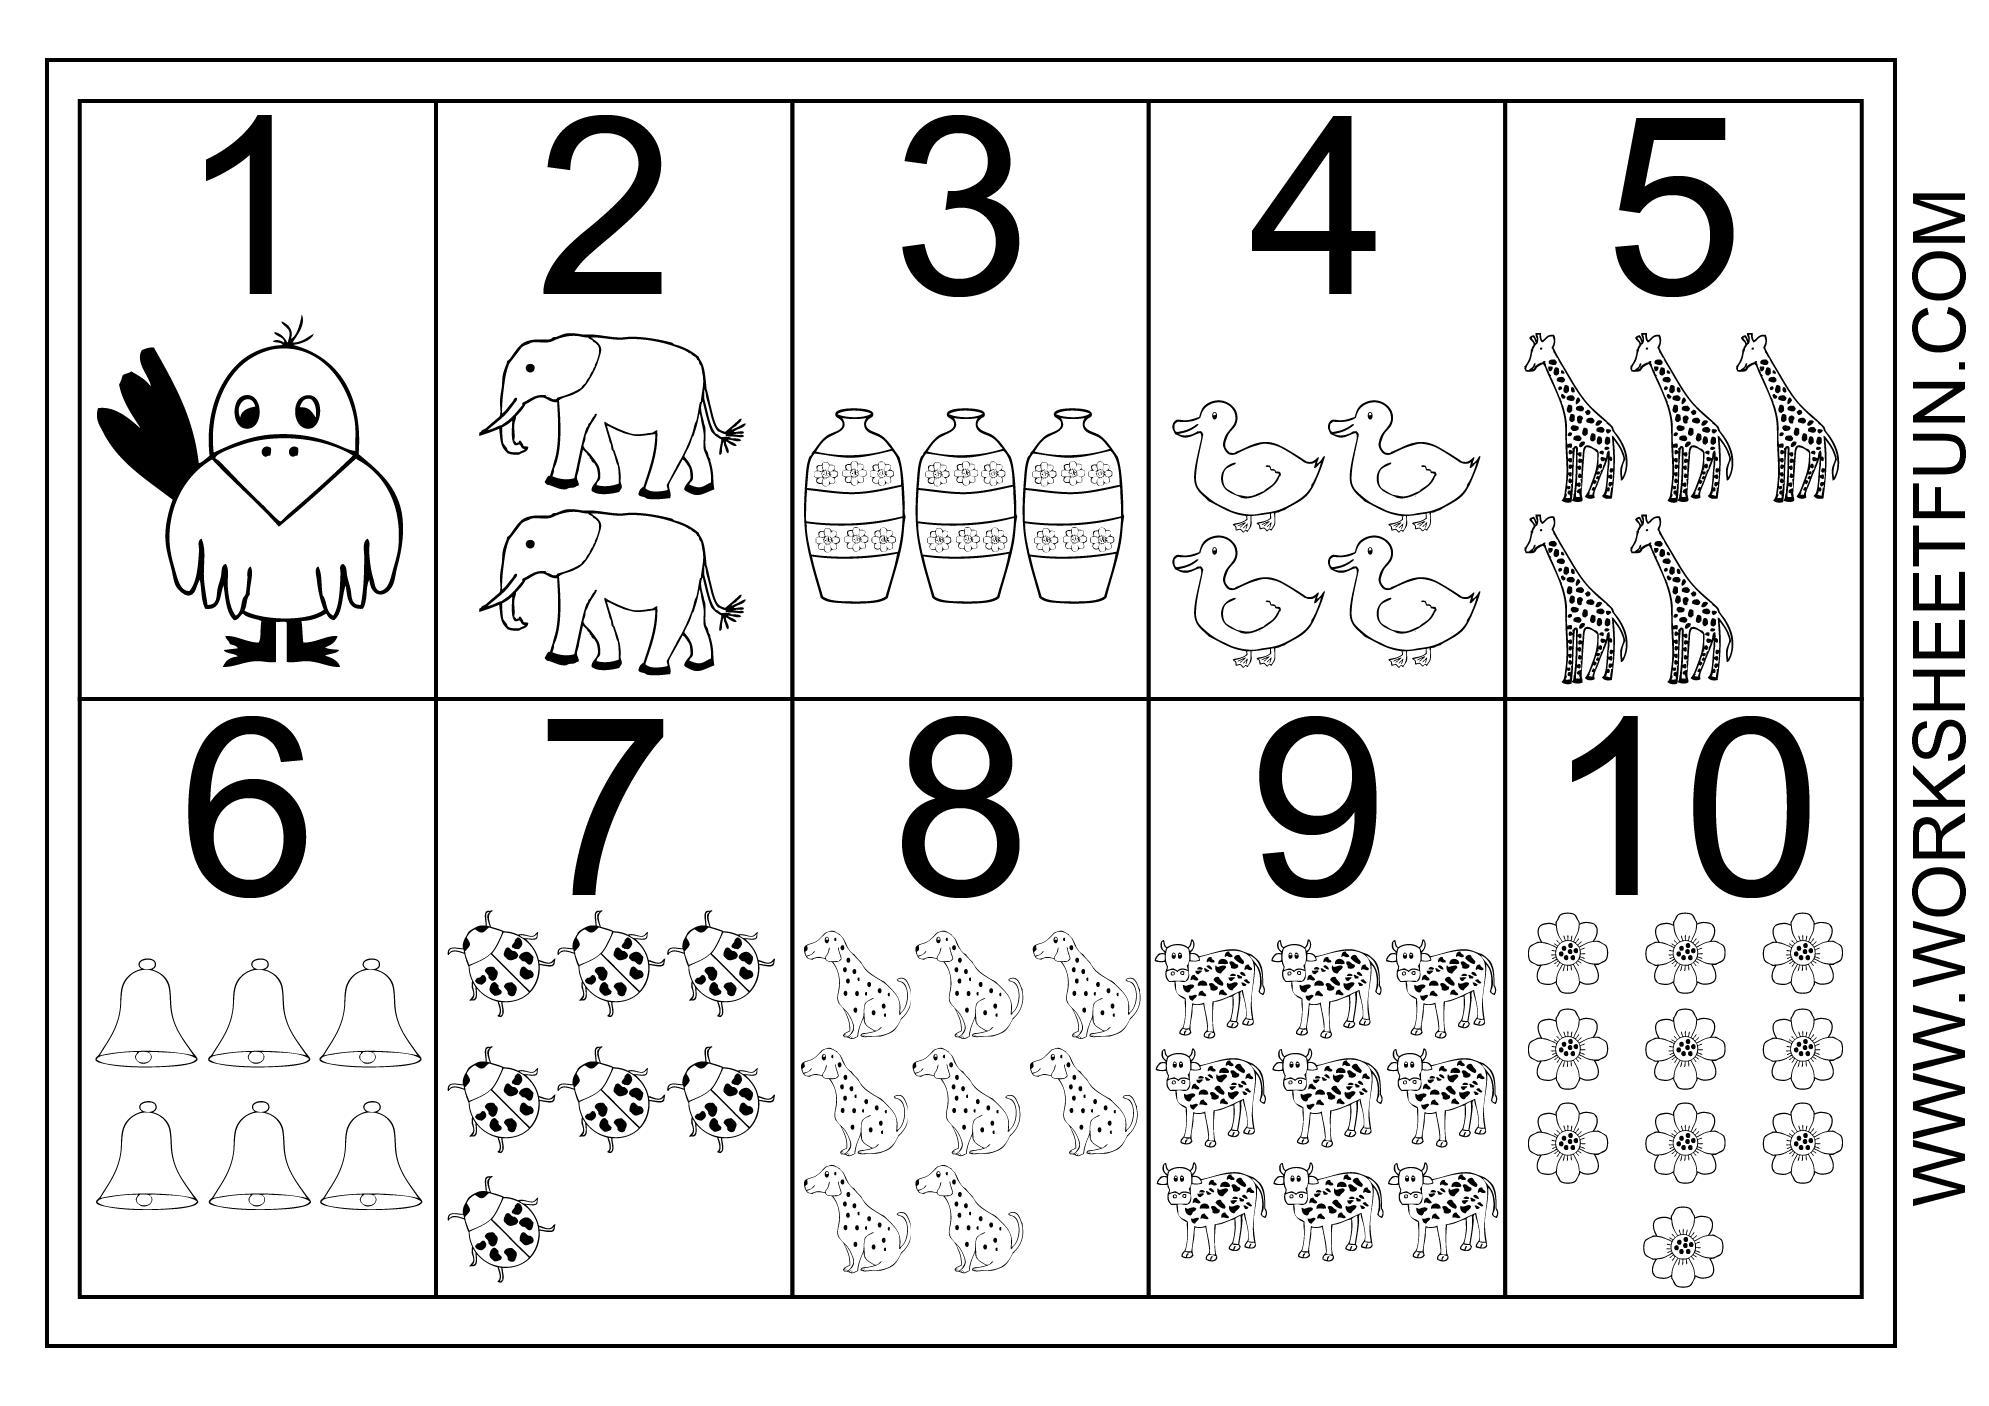 Preschool Worksheets Images 2